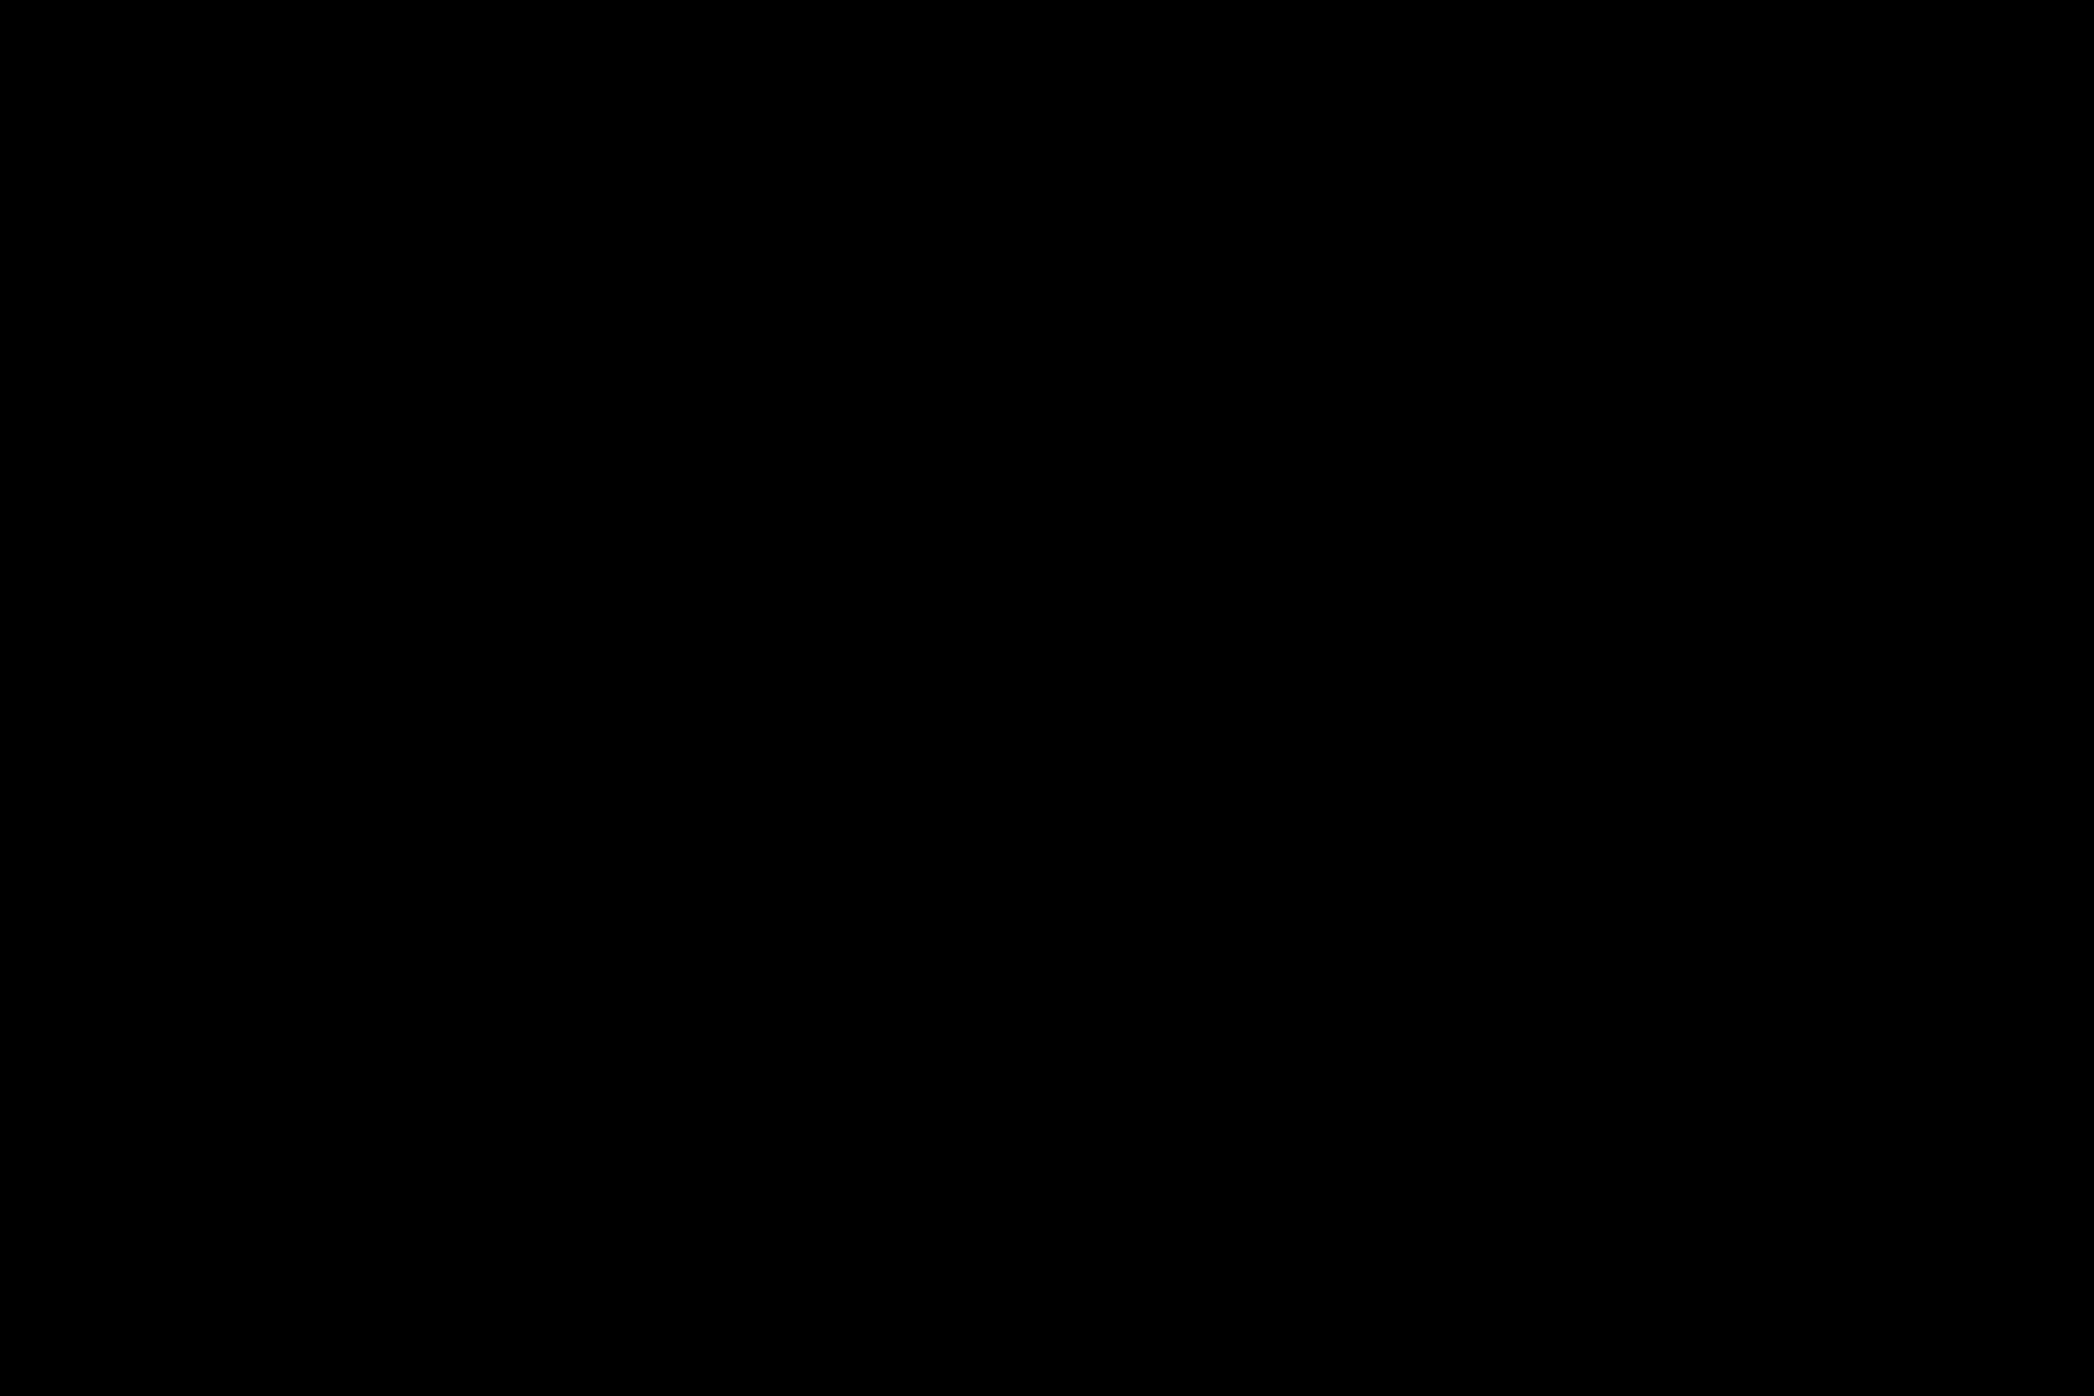 Tekbox LISN TBL5016-2